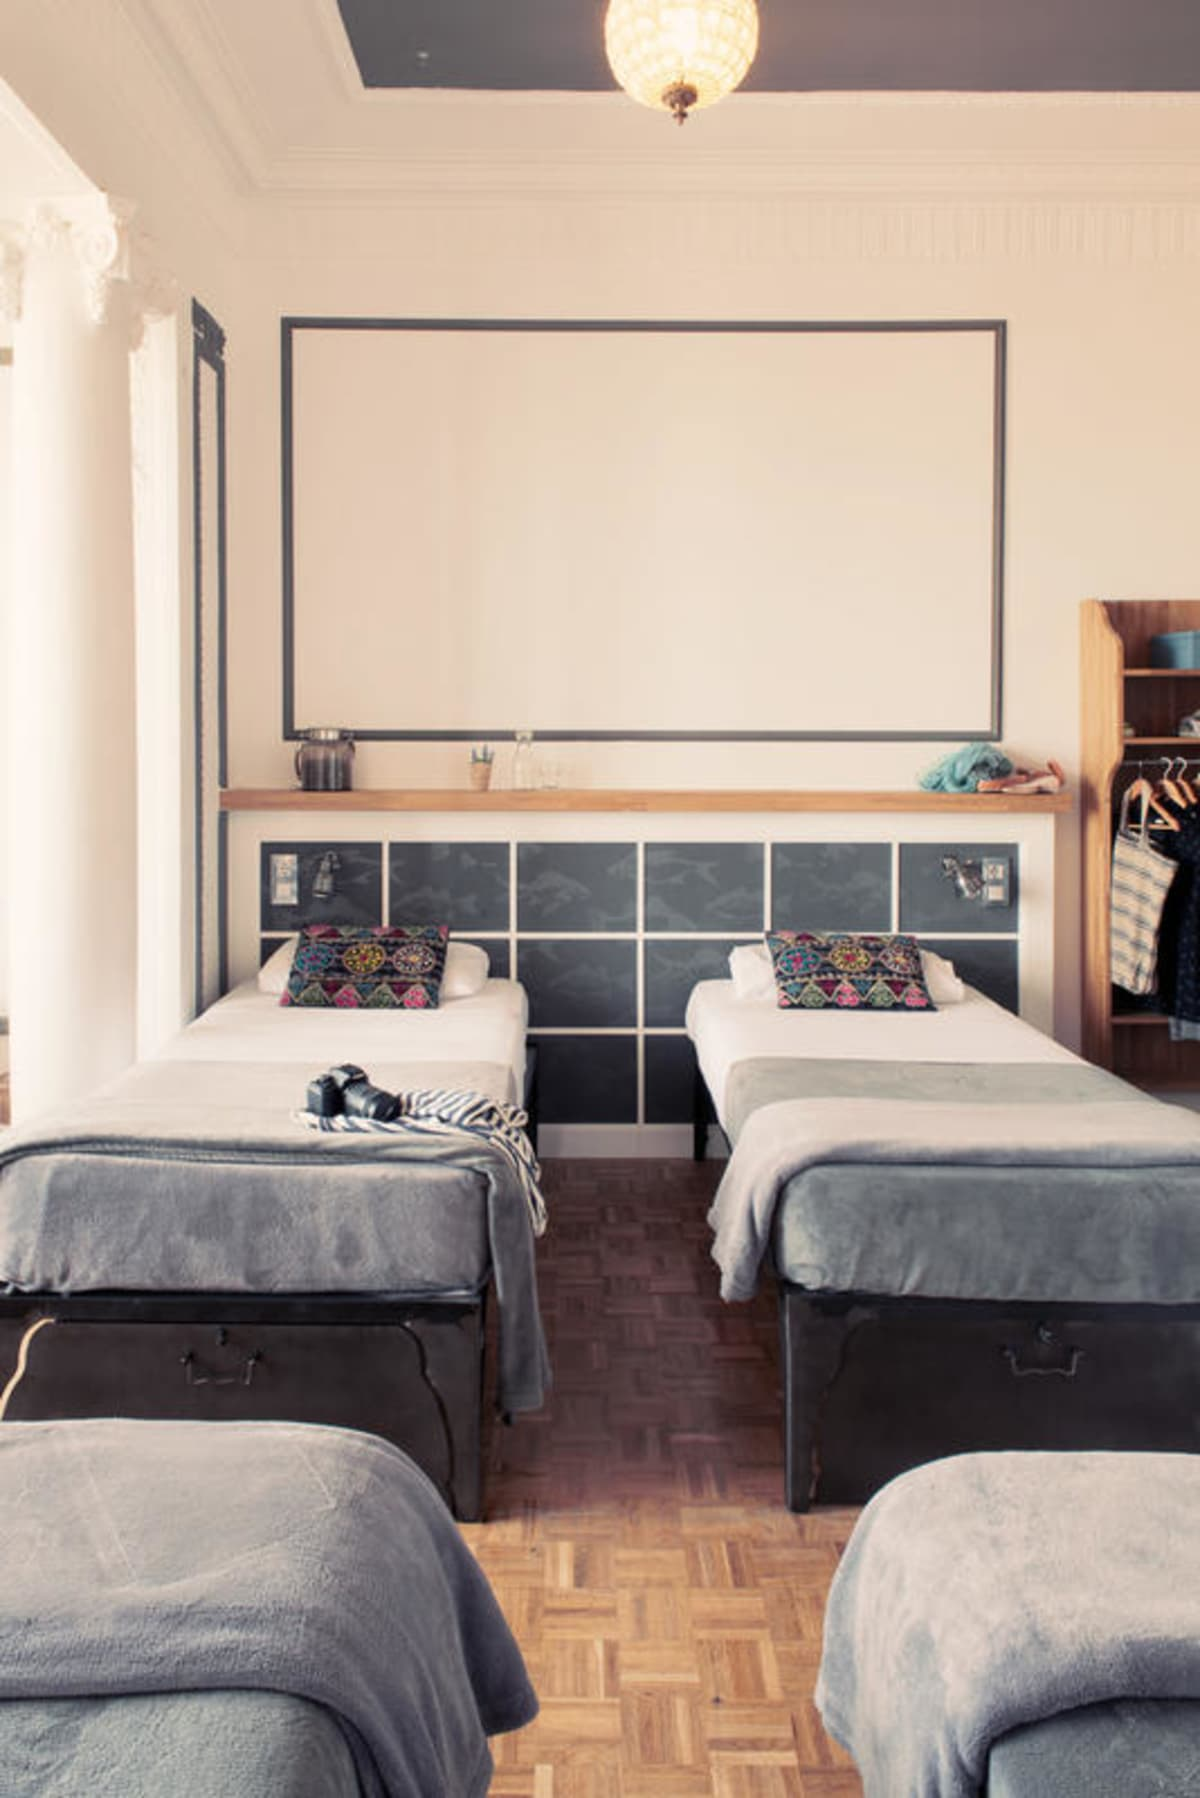 Casa Gracia Barcelona Hostel, Barcelona, Spain